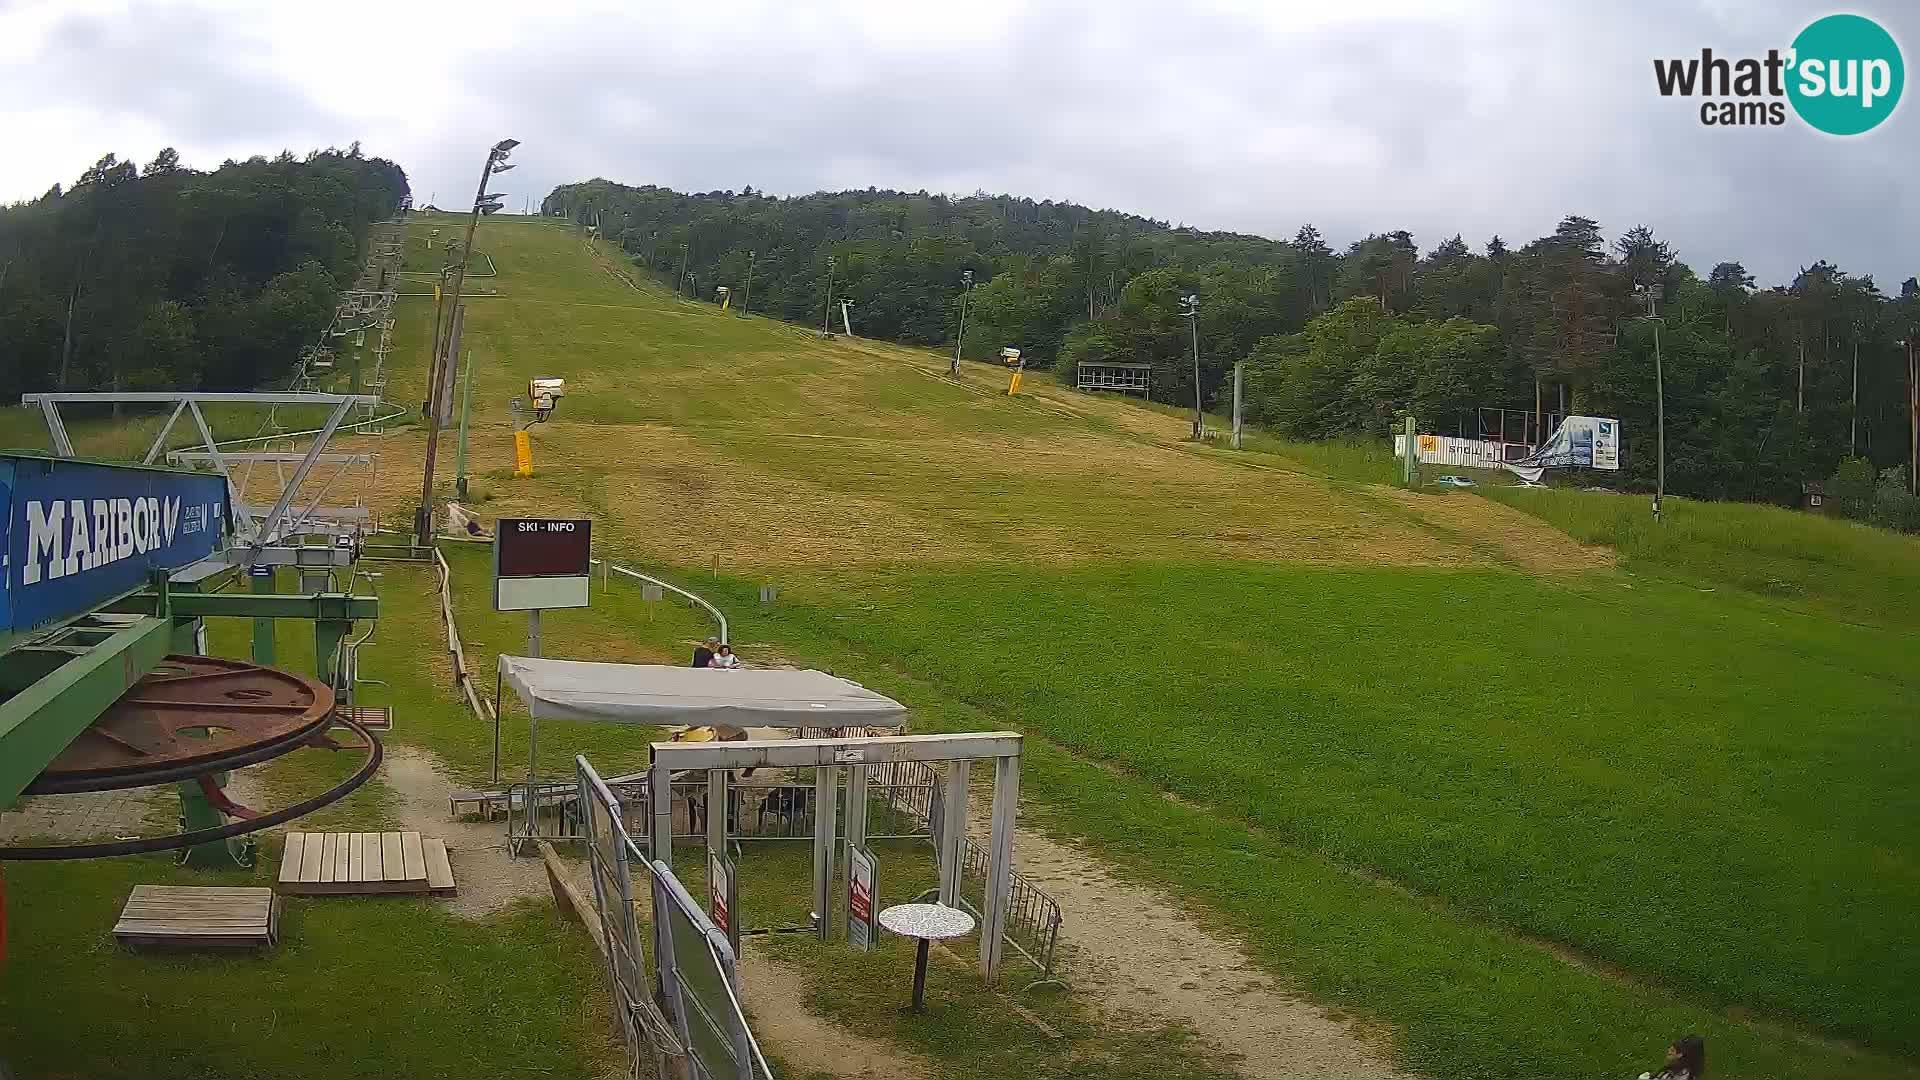 Maribor Pohorje – neige Stadium